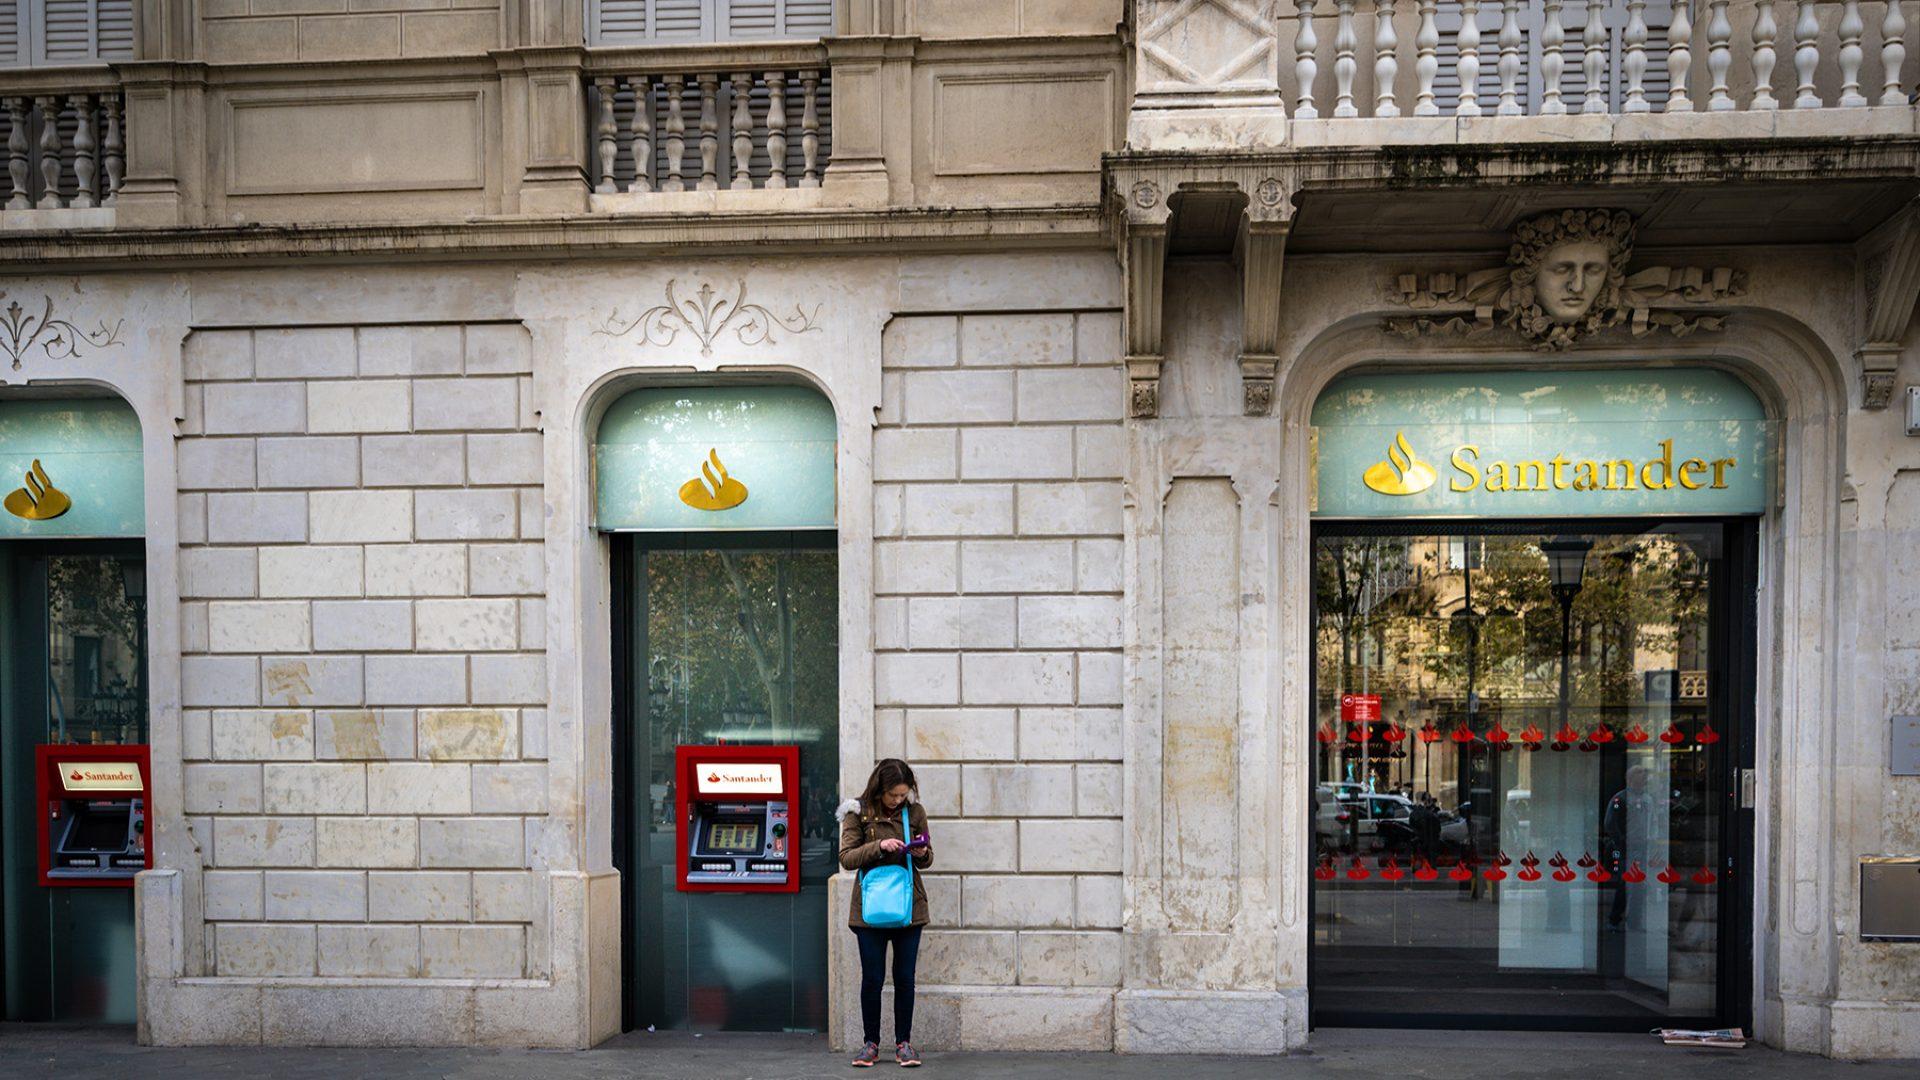 Spanish bank account